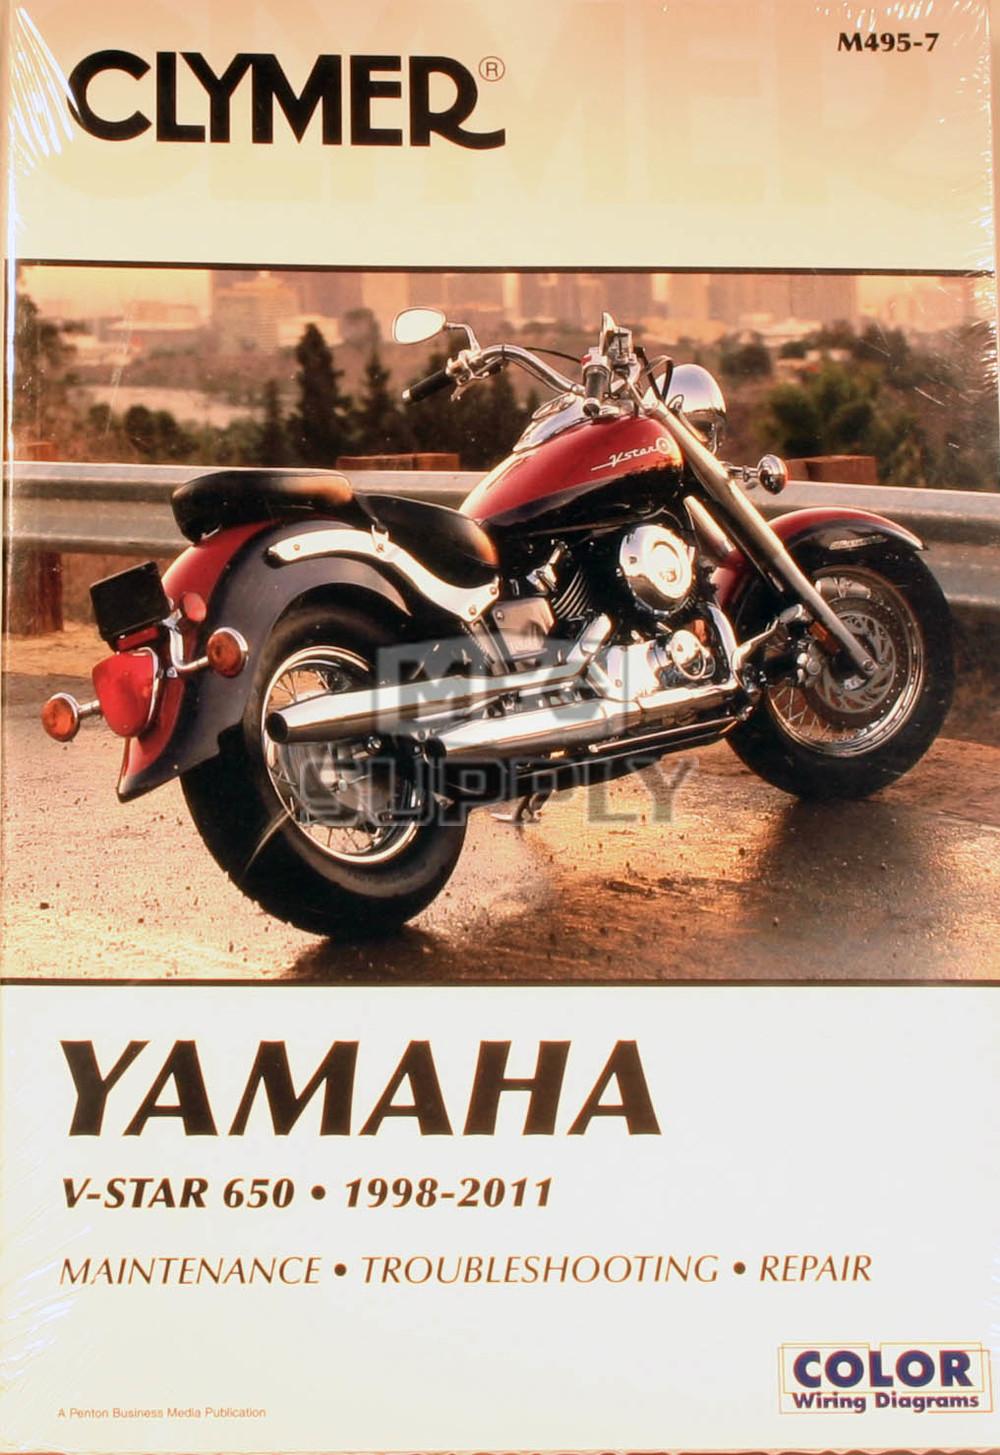 CM495 - 98-07 Yamaha V-Star 650, XVS650 Custom, XVS650A Classic